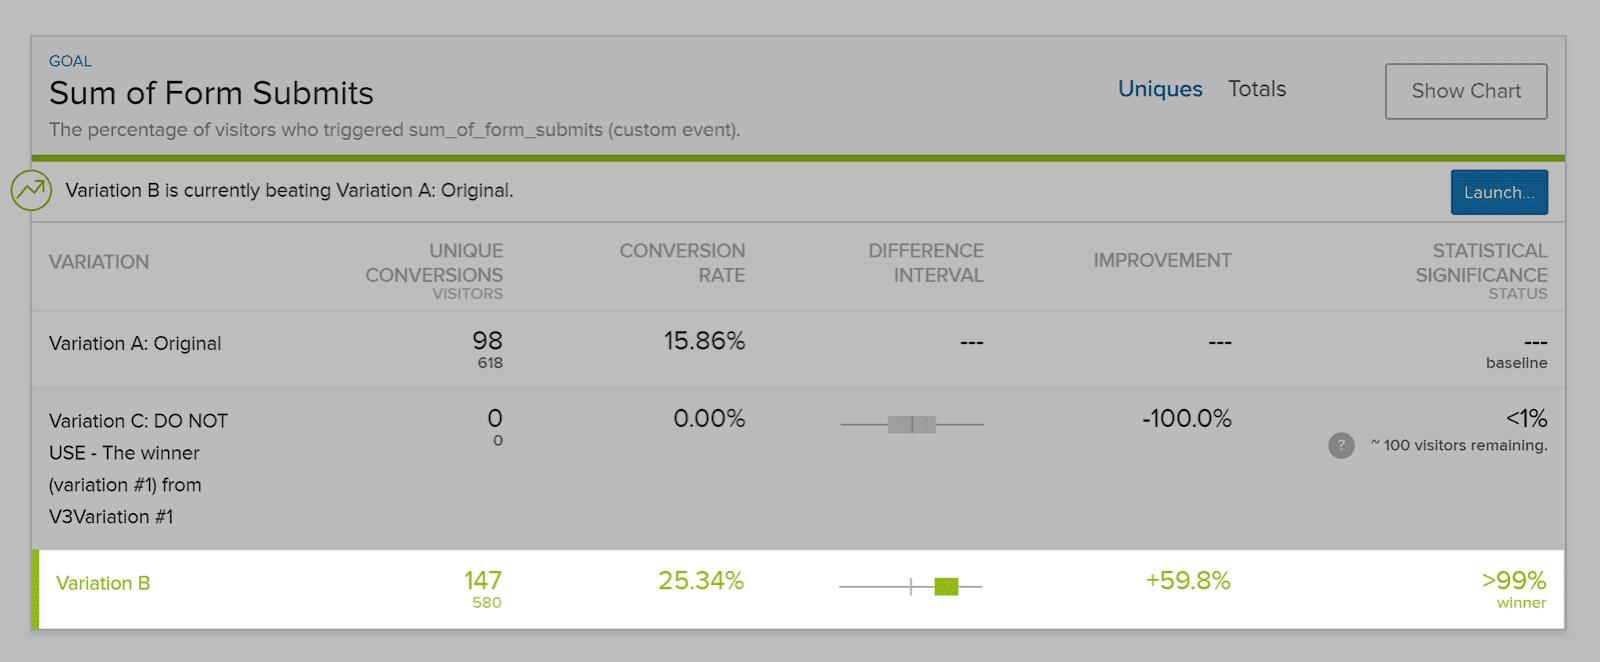 Статистика  результатов a/b тестирования сайта